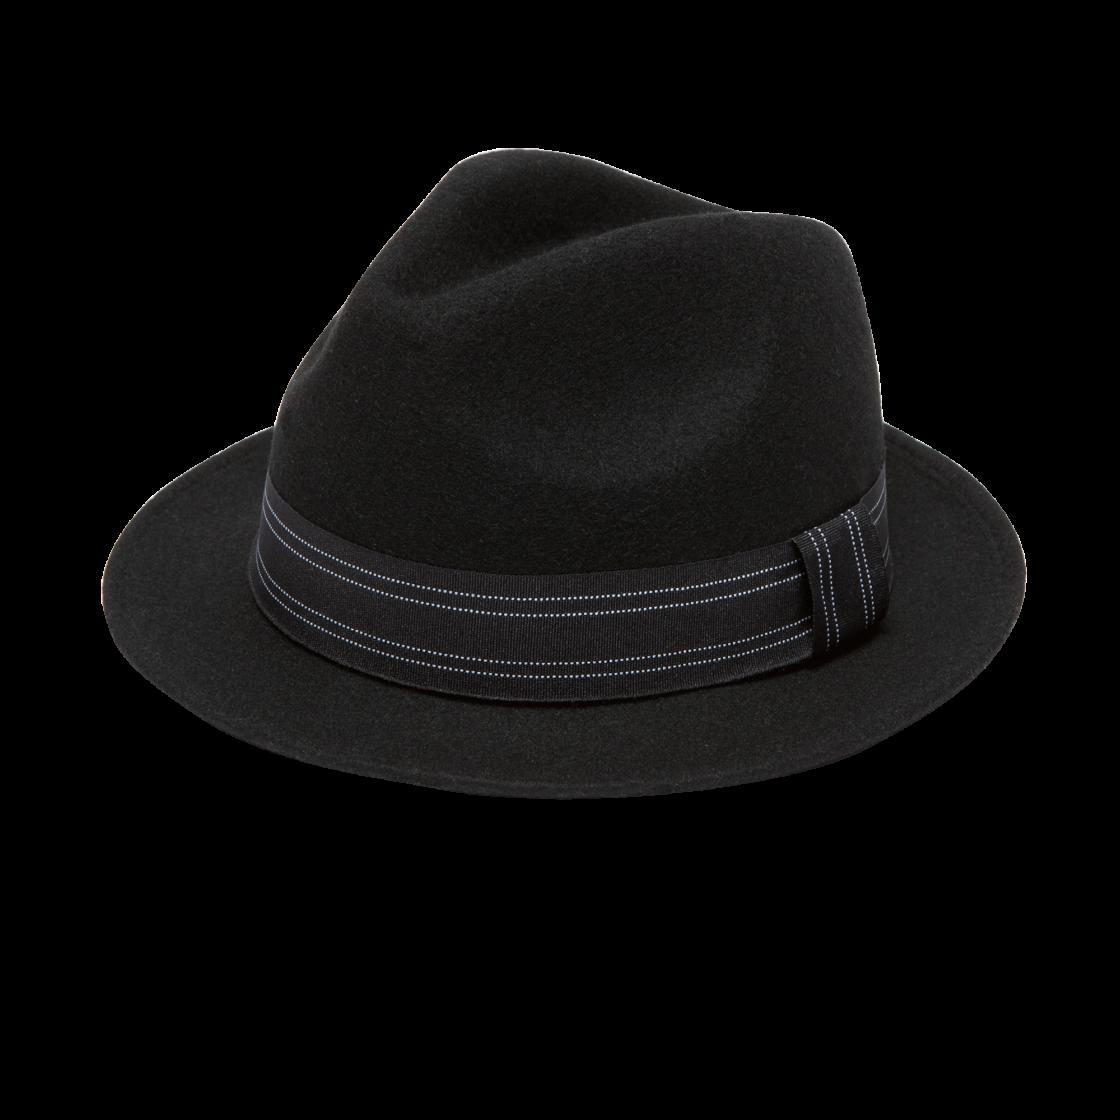 Rancher Felt Fedora Hat Black Left Side